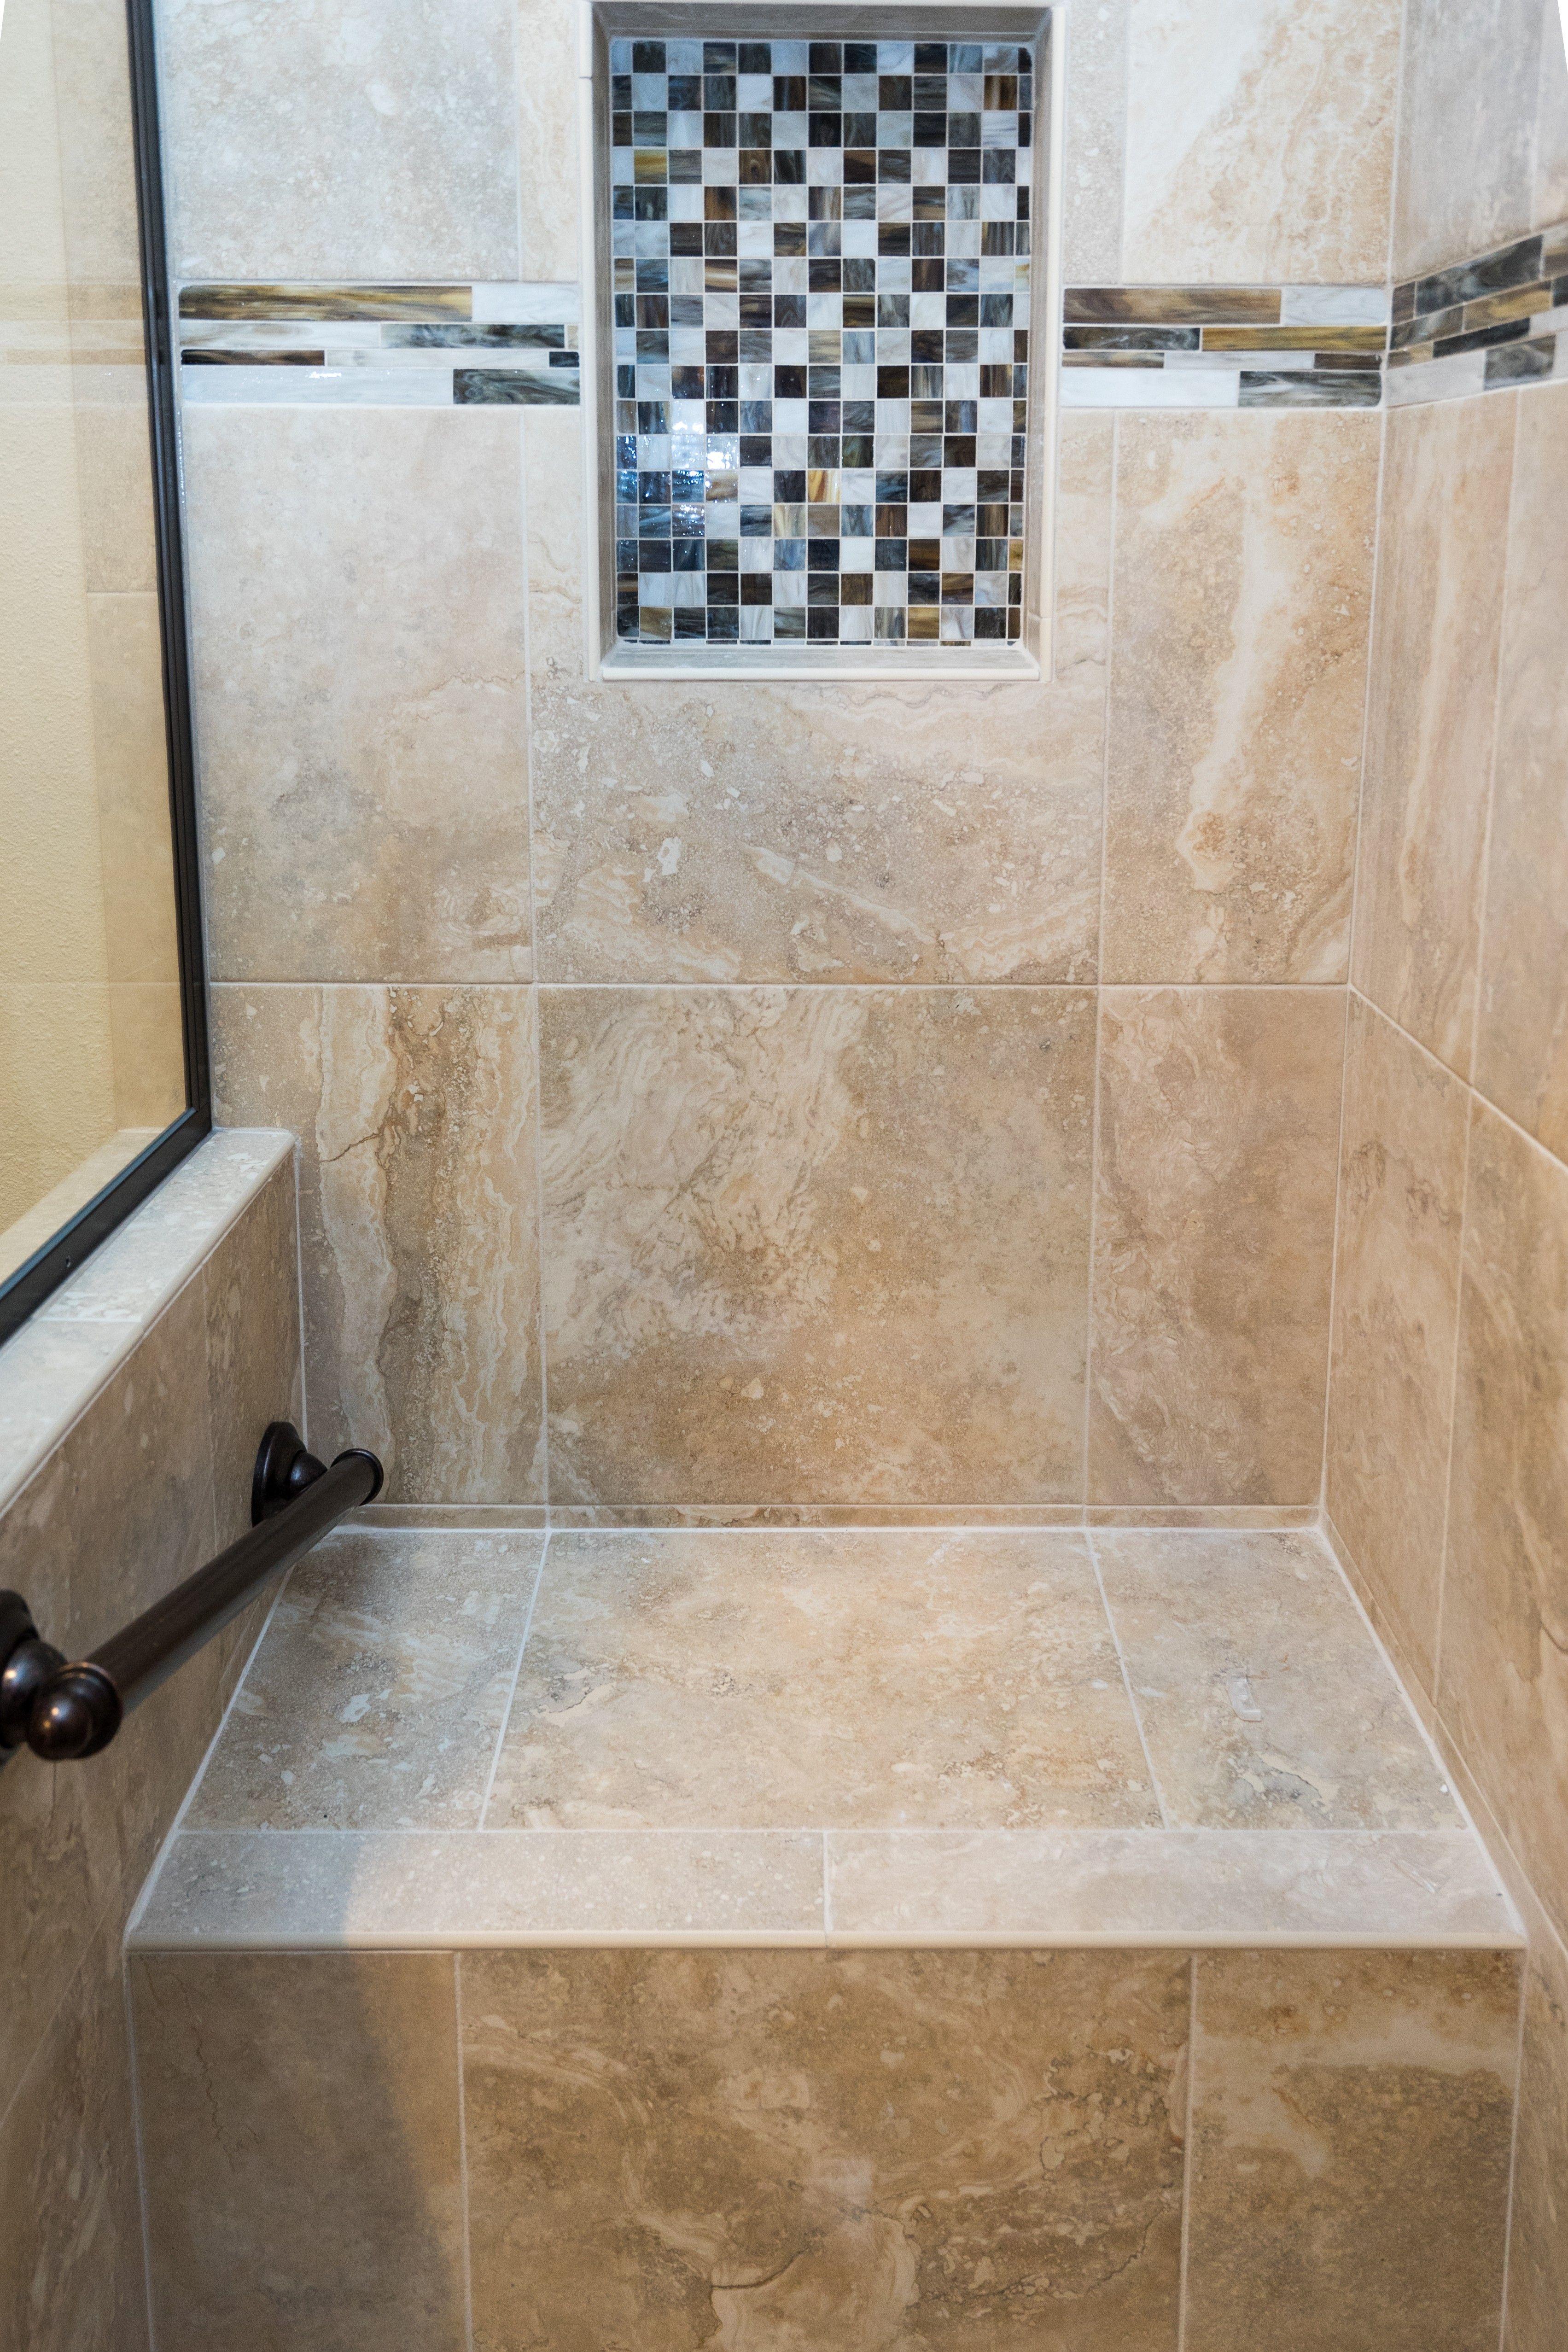 This Bathroom Remodel Is A Breath Of Fresh Airwith A Modern Custom San Diego Bathroom Remodeling Inspiration Design